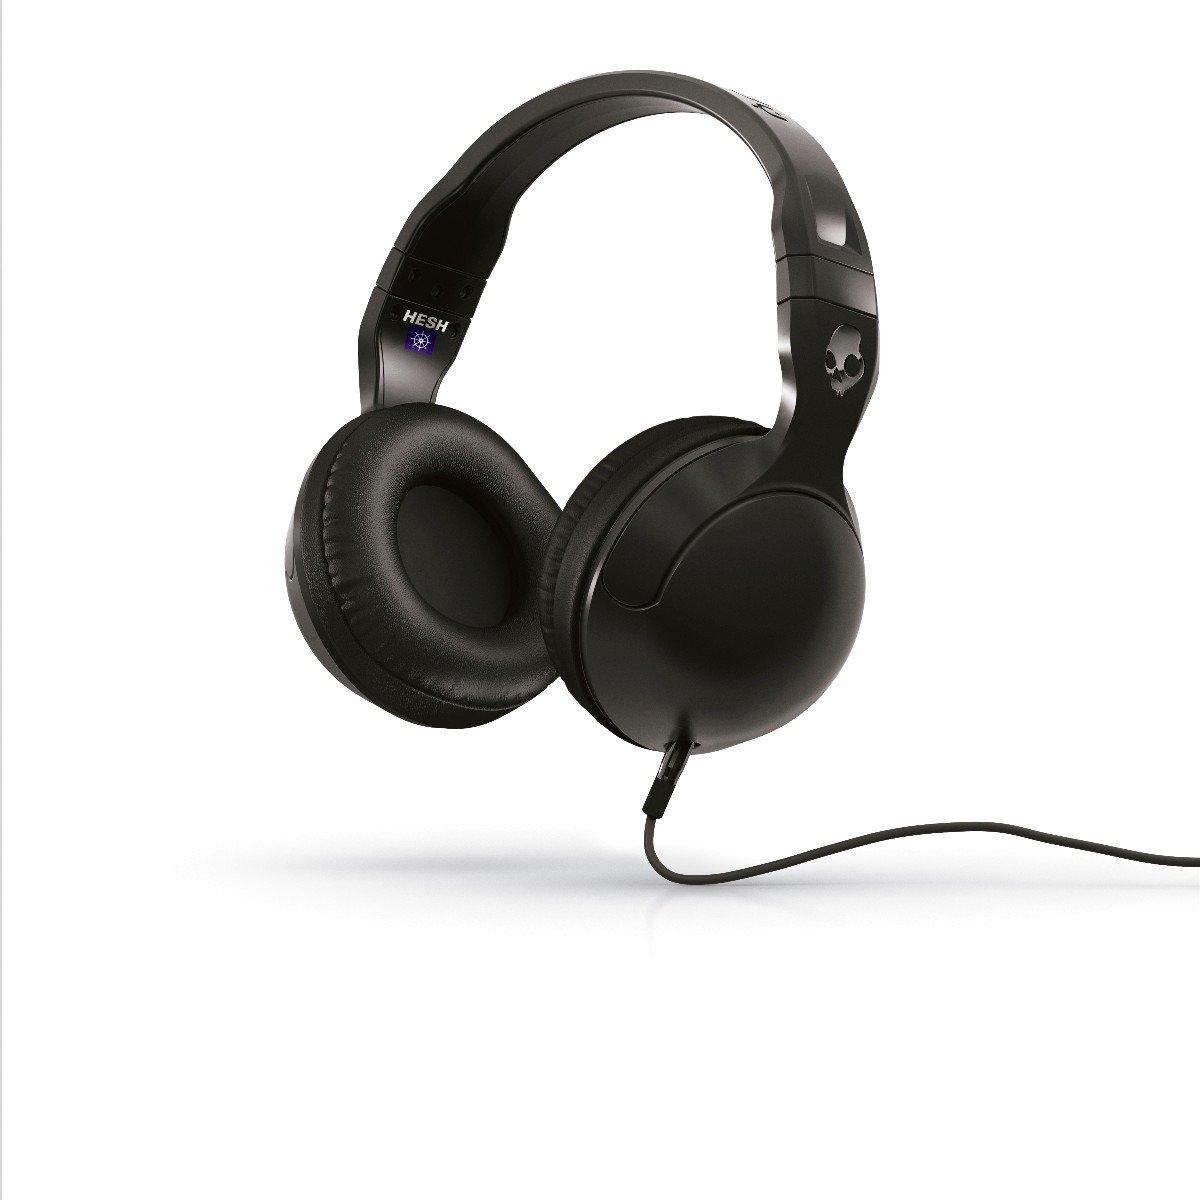 Skullcandy Hesh 2 Over-Ear Headphones with Mic, Black